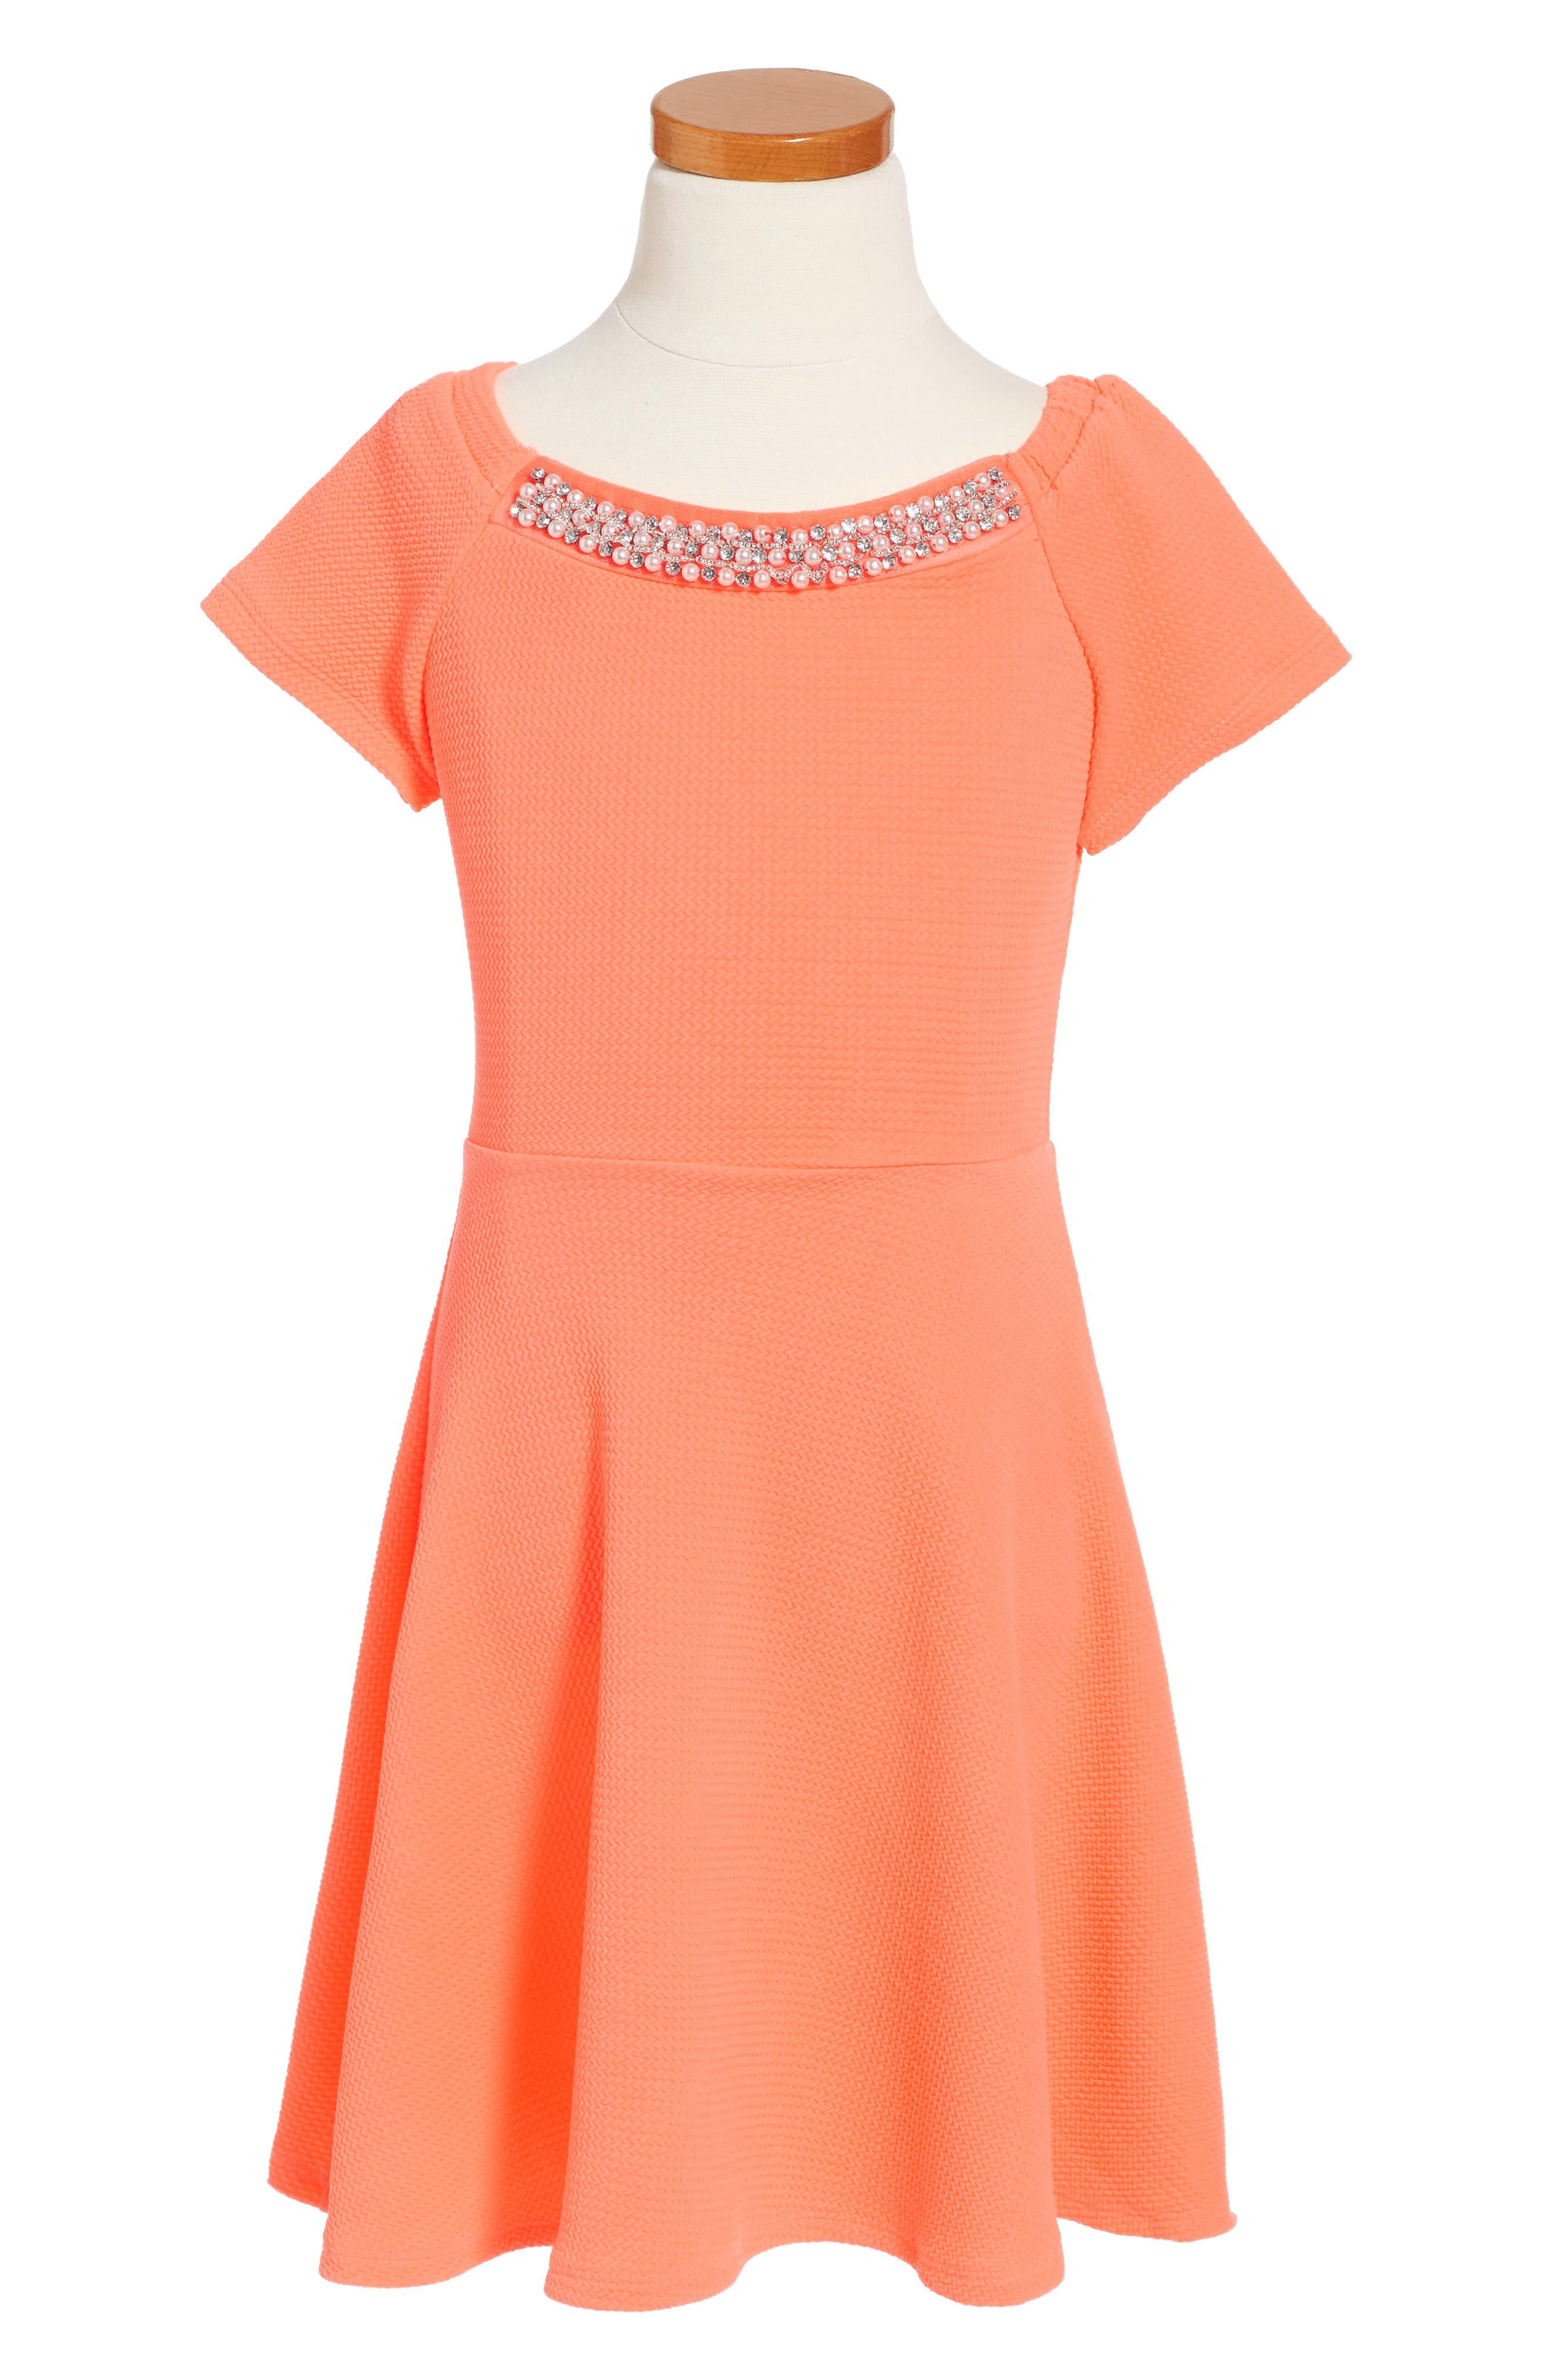 Skater Dress,                         Main,                         color, 820